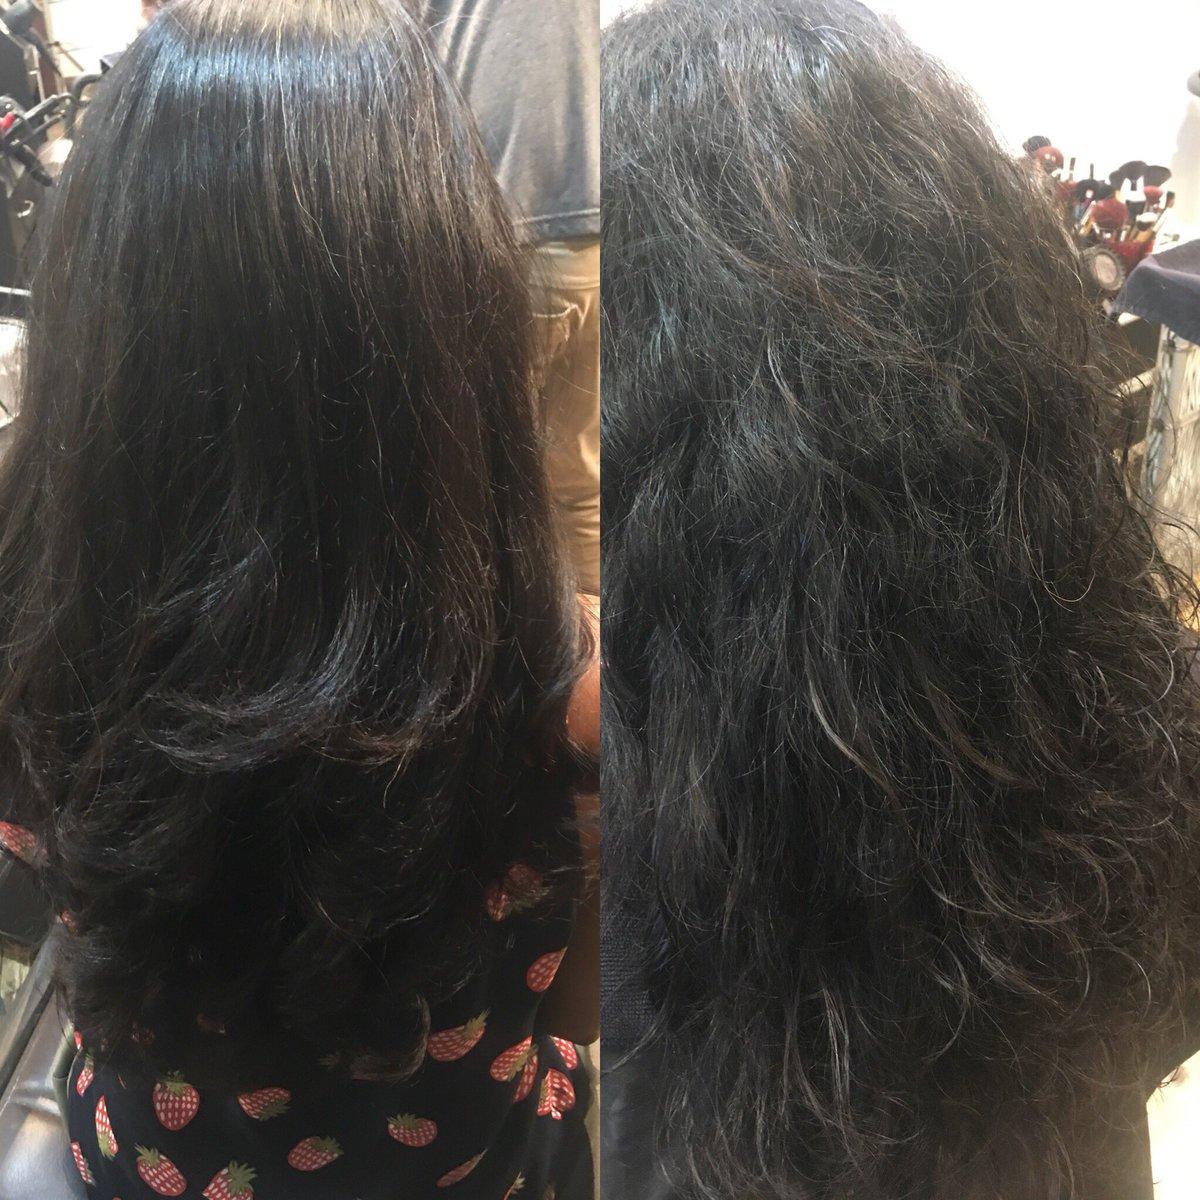 Makarizo Rebonding System Tube Set For Curly Hair Daftar Harga Y2000 Obat Pelurus Rambut Self Straightening Gel Smoothing Bestseller Daniel Lynn Salon Danielynnsalon Magicsleek Smoothingtreatment Nofrizzpictwittercom Ivufxyo7ja